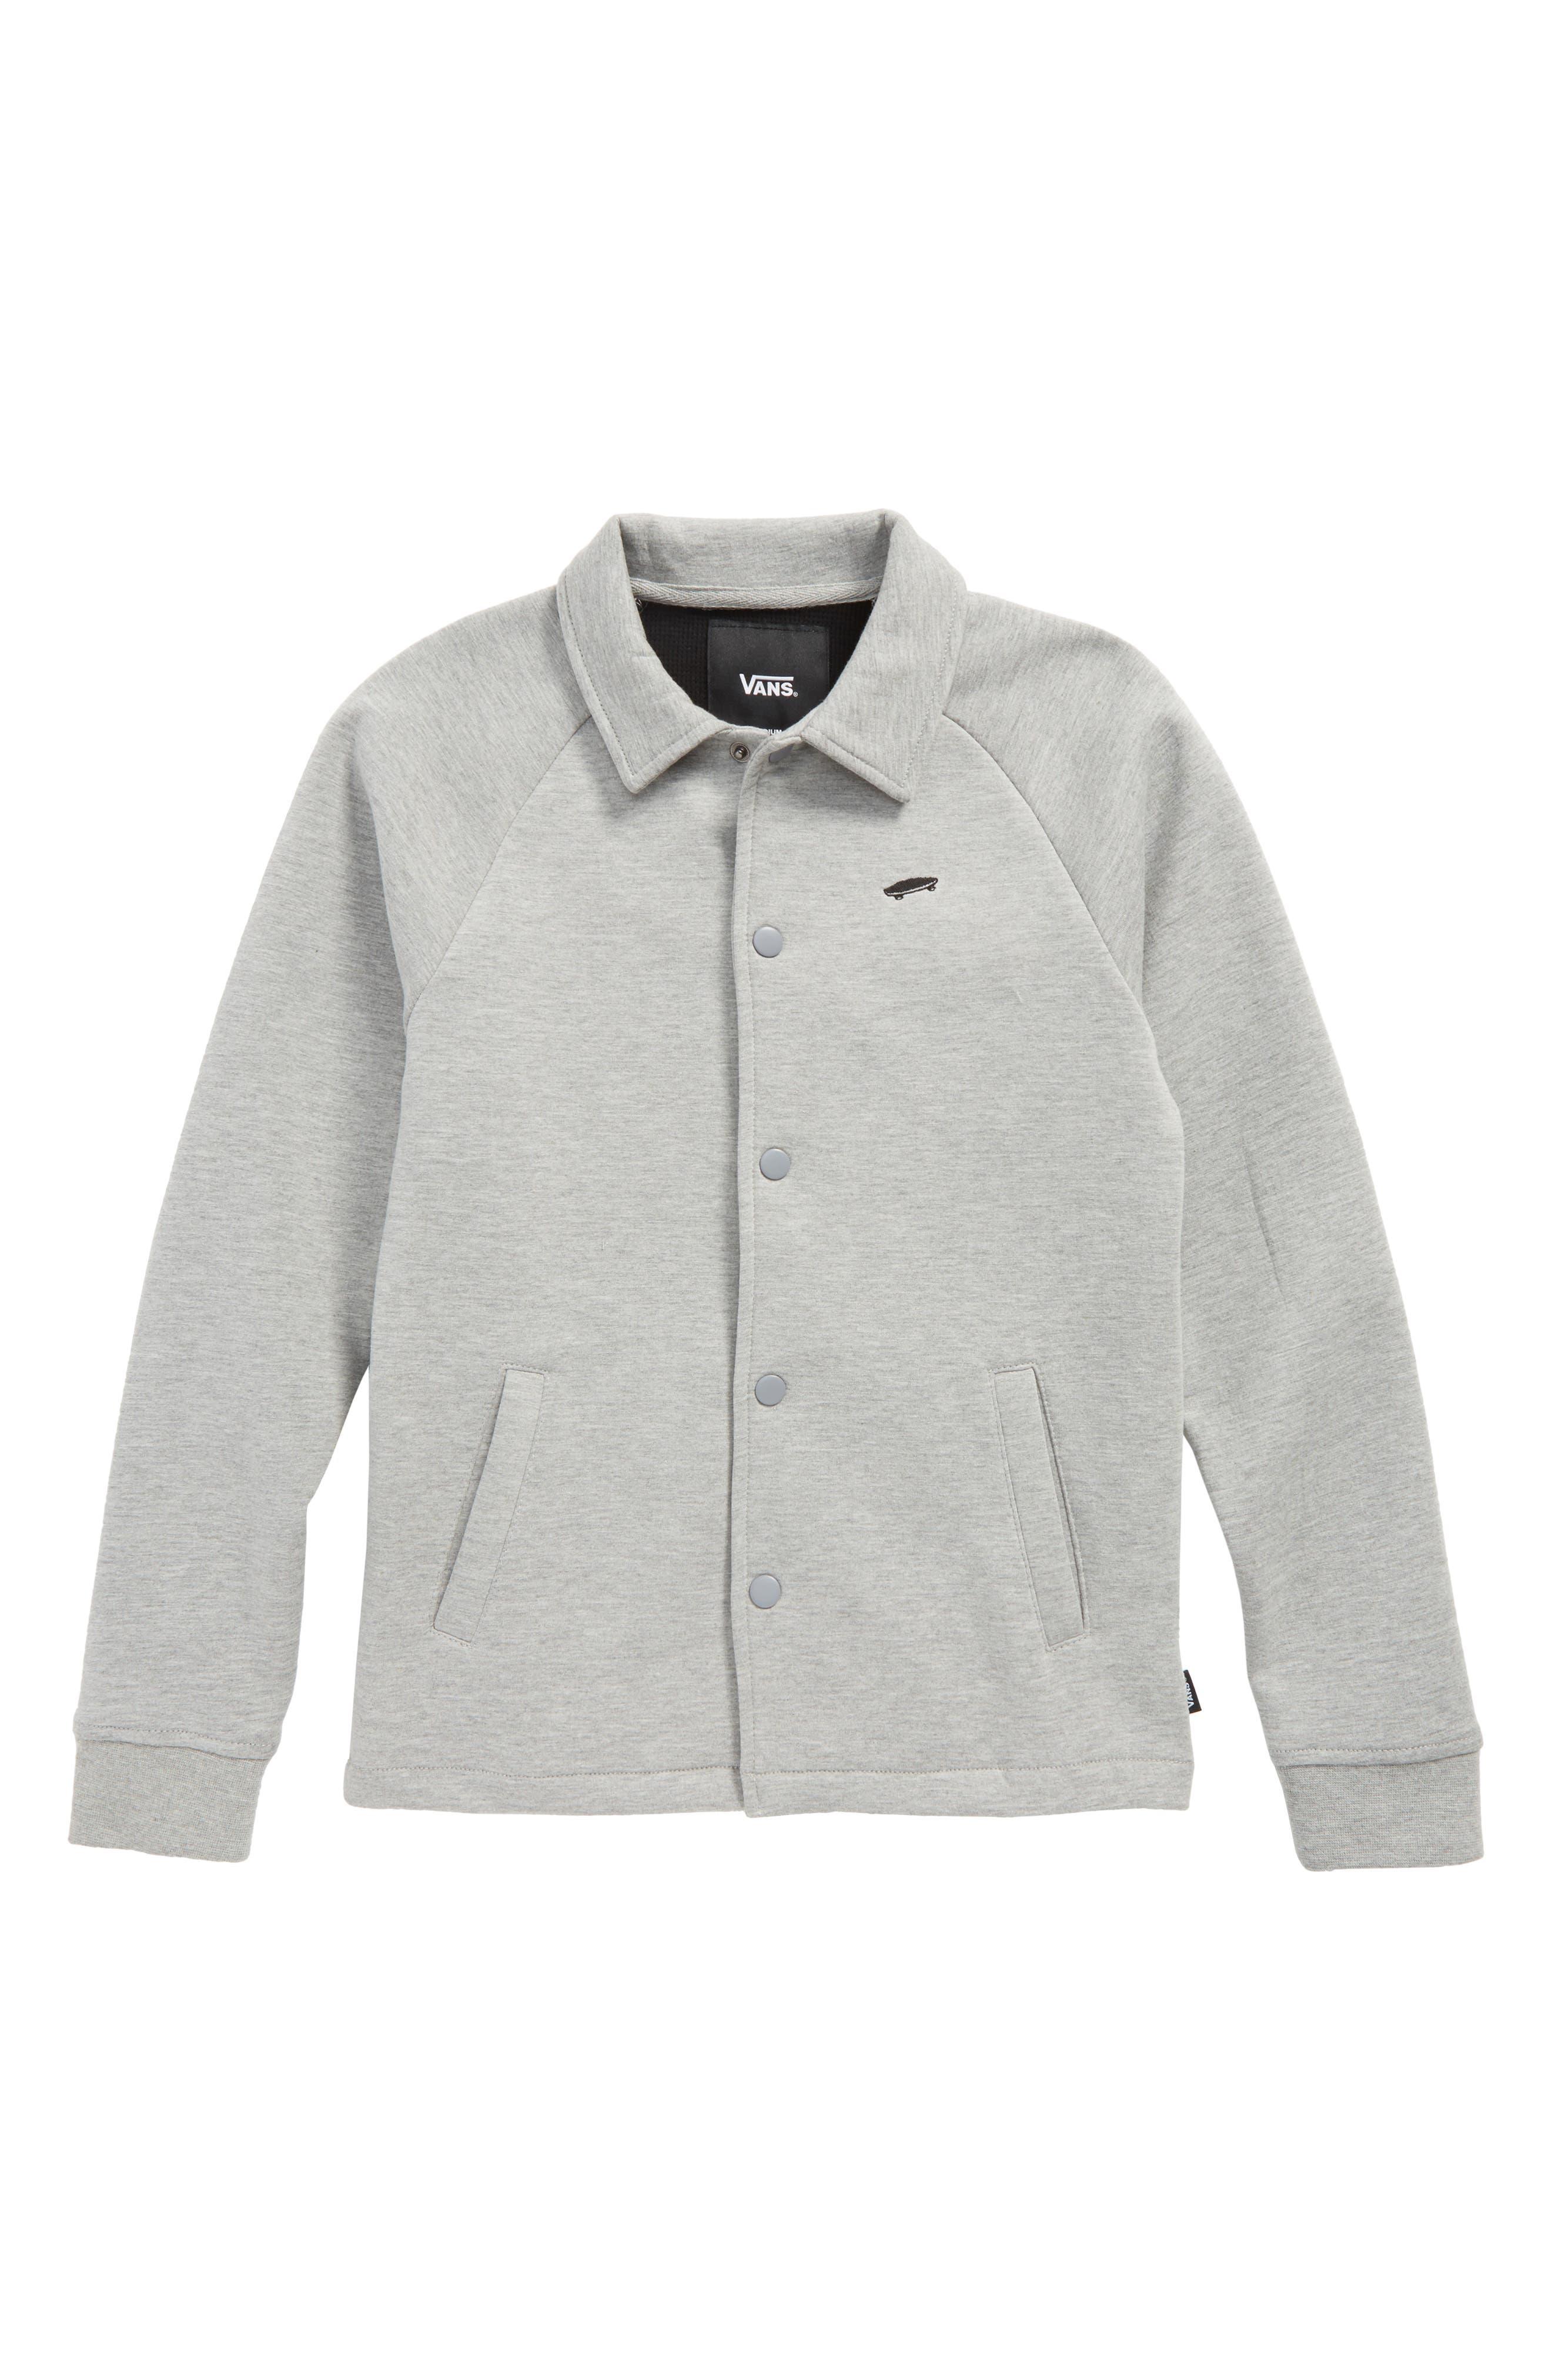 Torrey Fleece Jacket,                             Main thumbnail 1, color,                             021